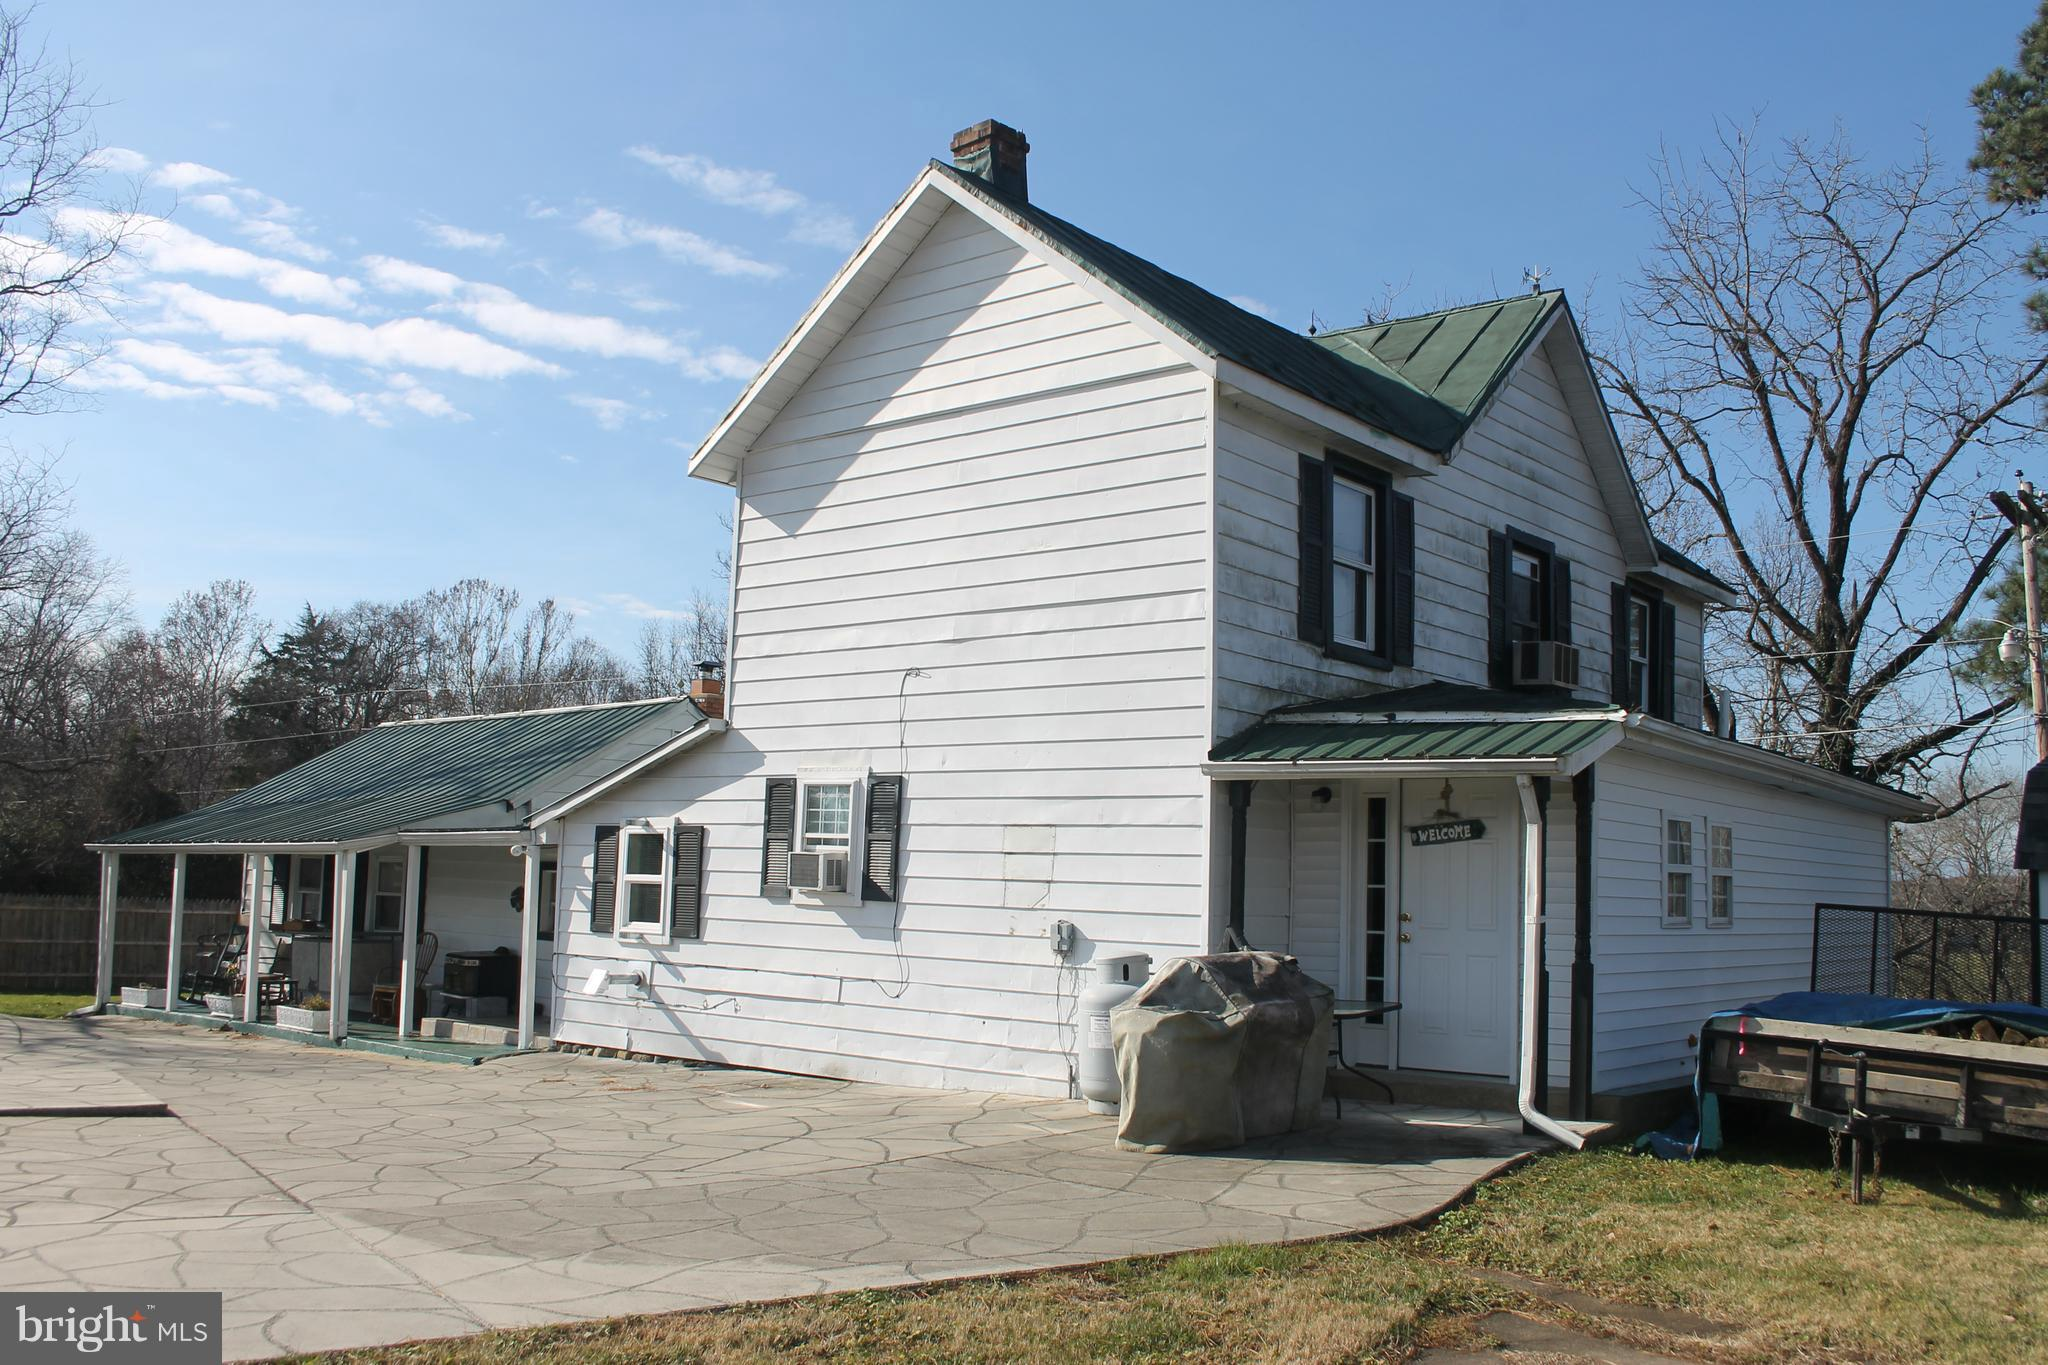 18094 BRIGHTWOOD LANE, JEFFERSONTON, VA 22724